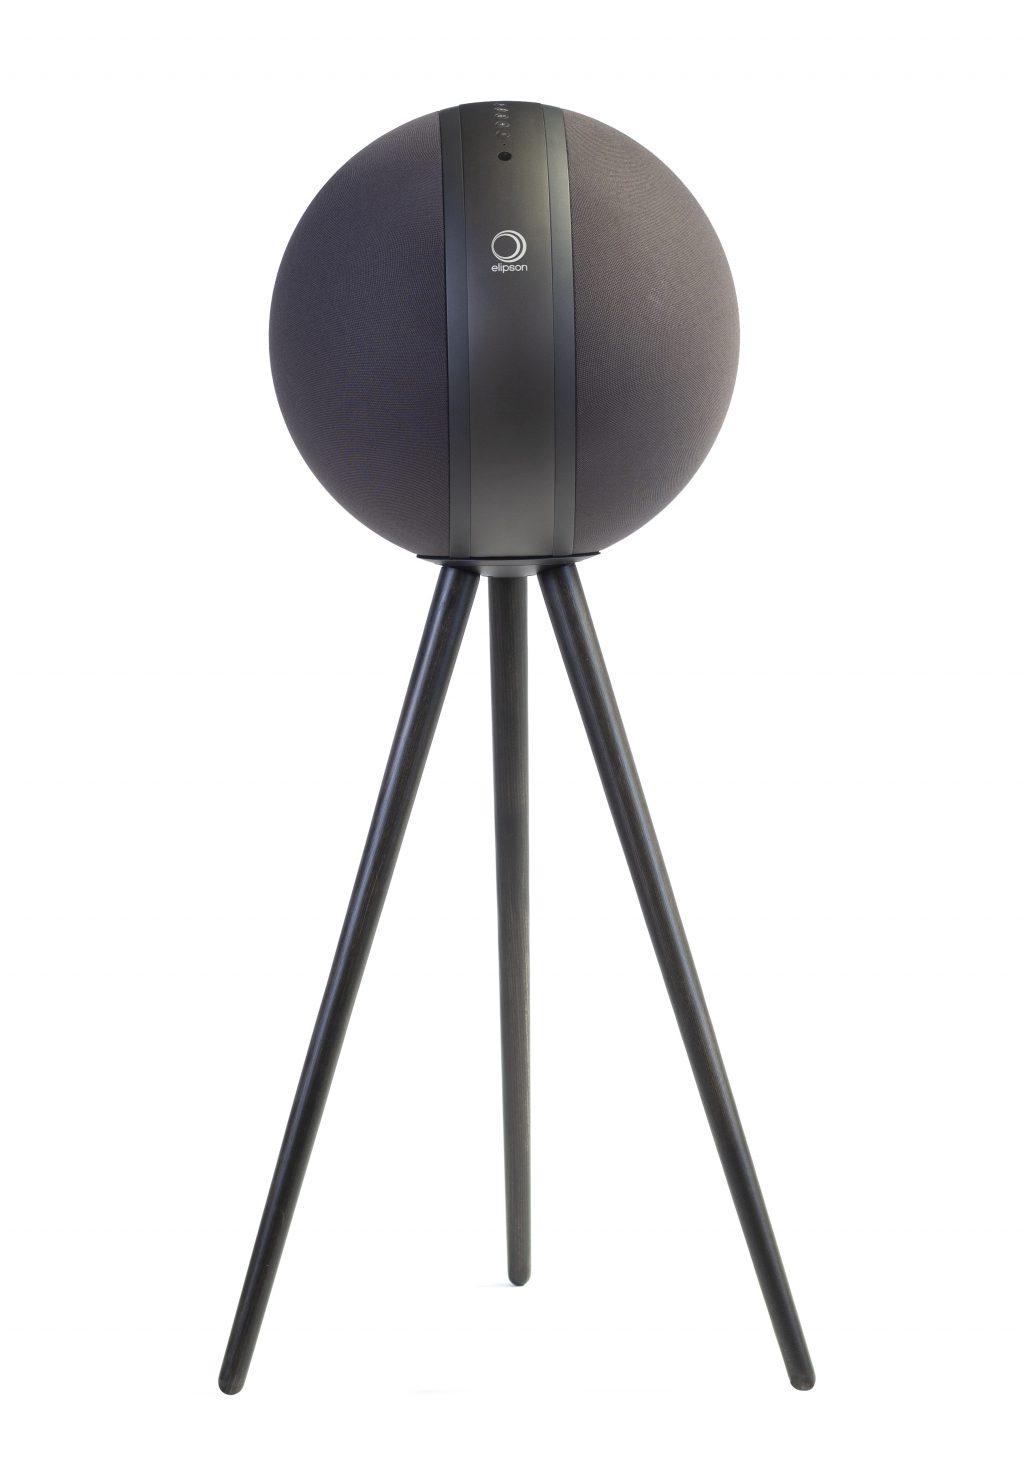 Elipson's Planet W35 speaker